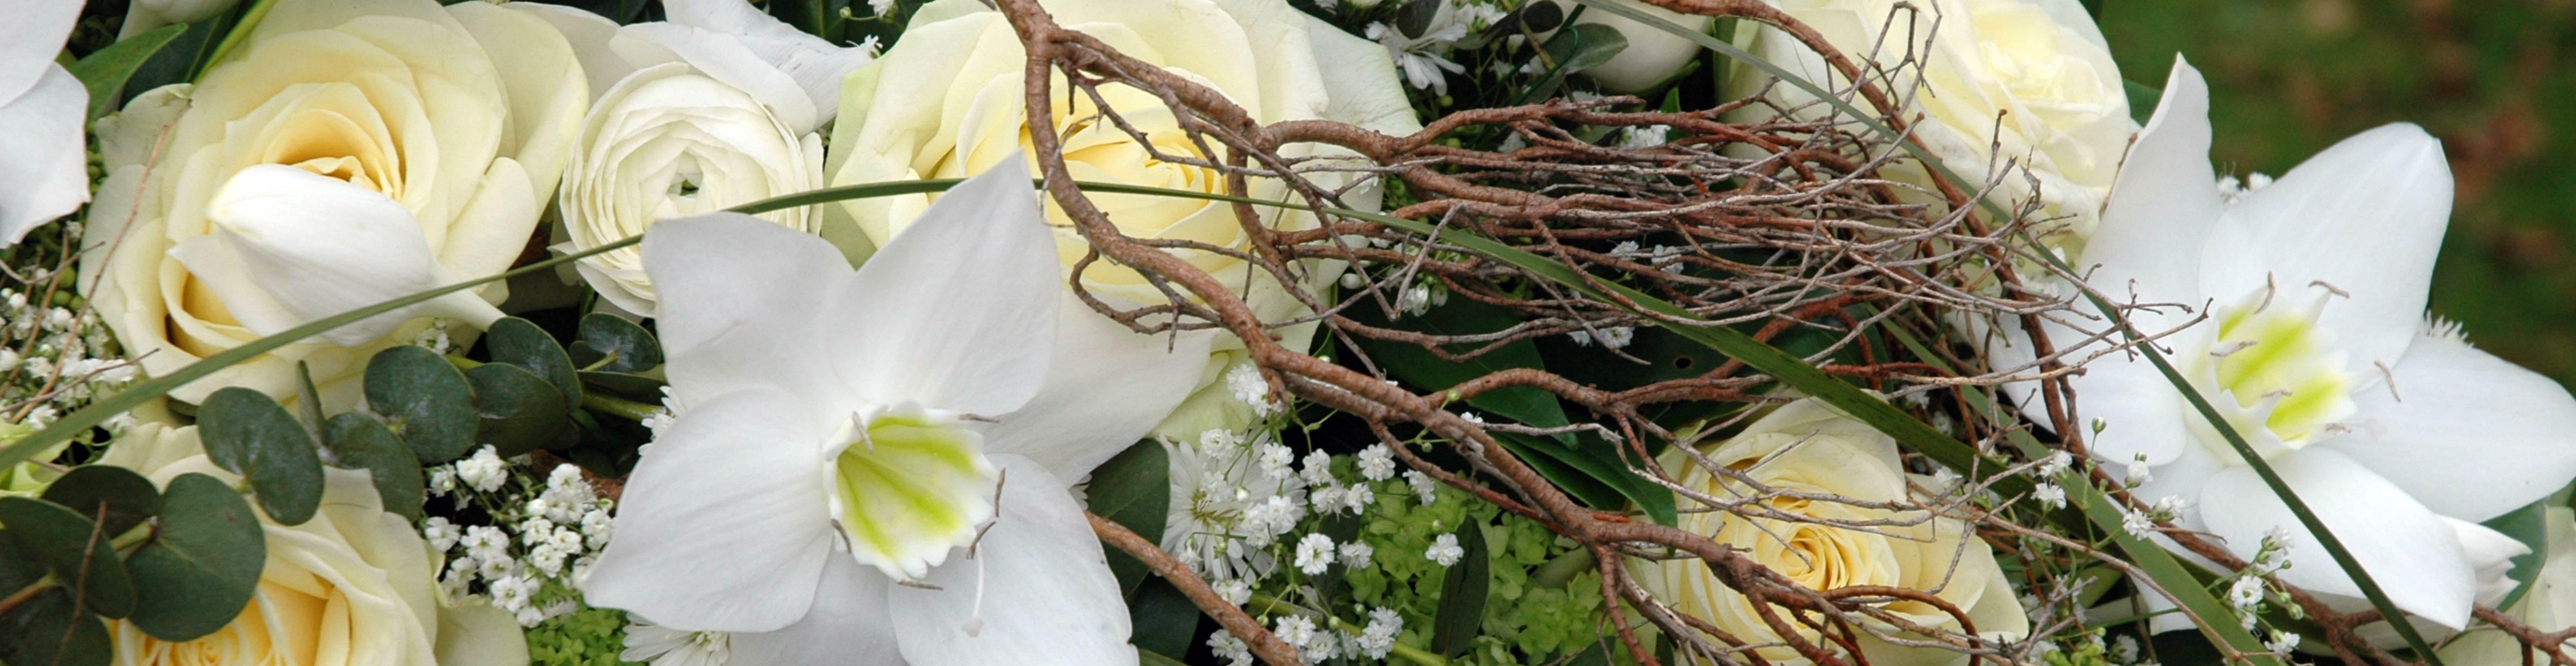 Landschaftsgärtner Tübingen gärtnerei blumen stephan gartenbau floristik tübingen startseite